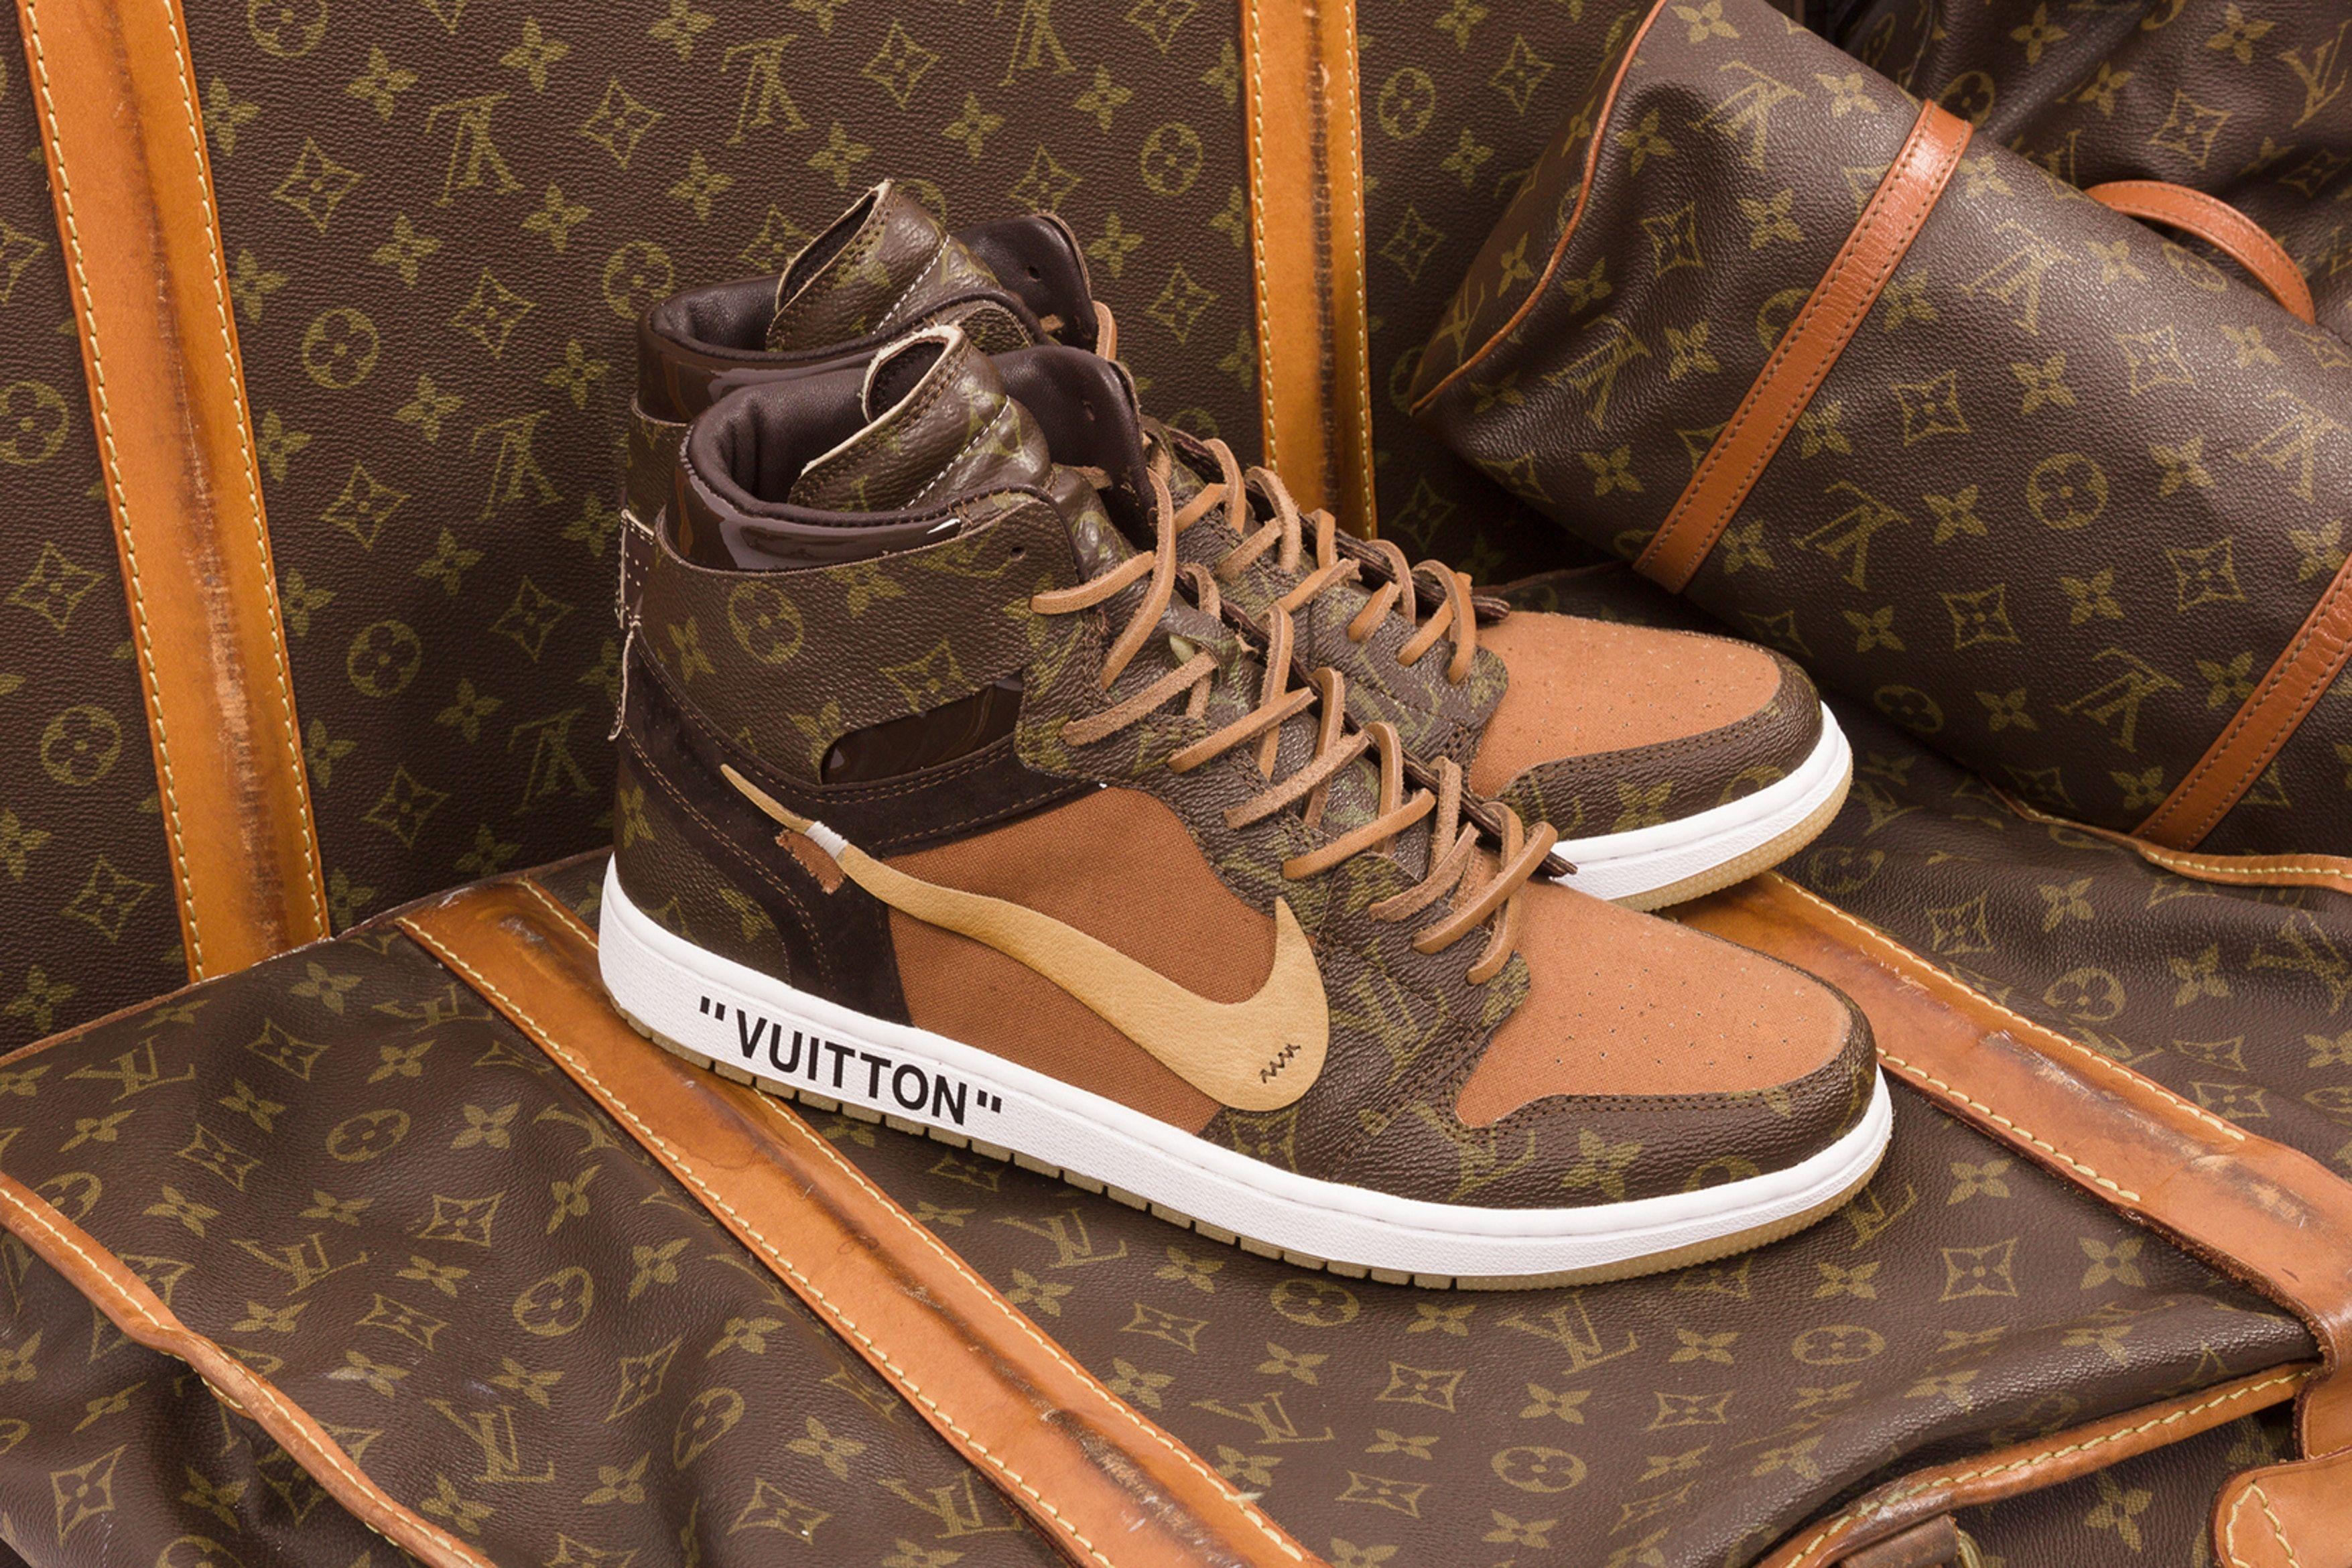 b196bd41670 Customizer Celebrates Virgil Abloh's Louis Vuitton Appointment With ...